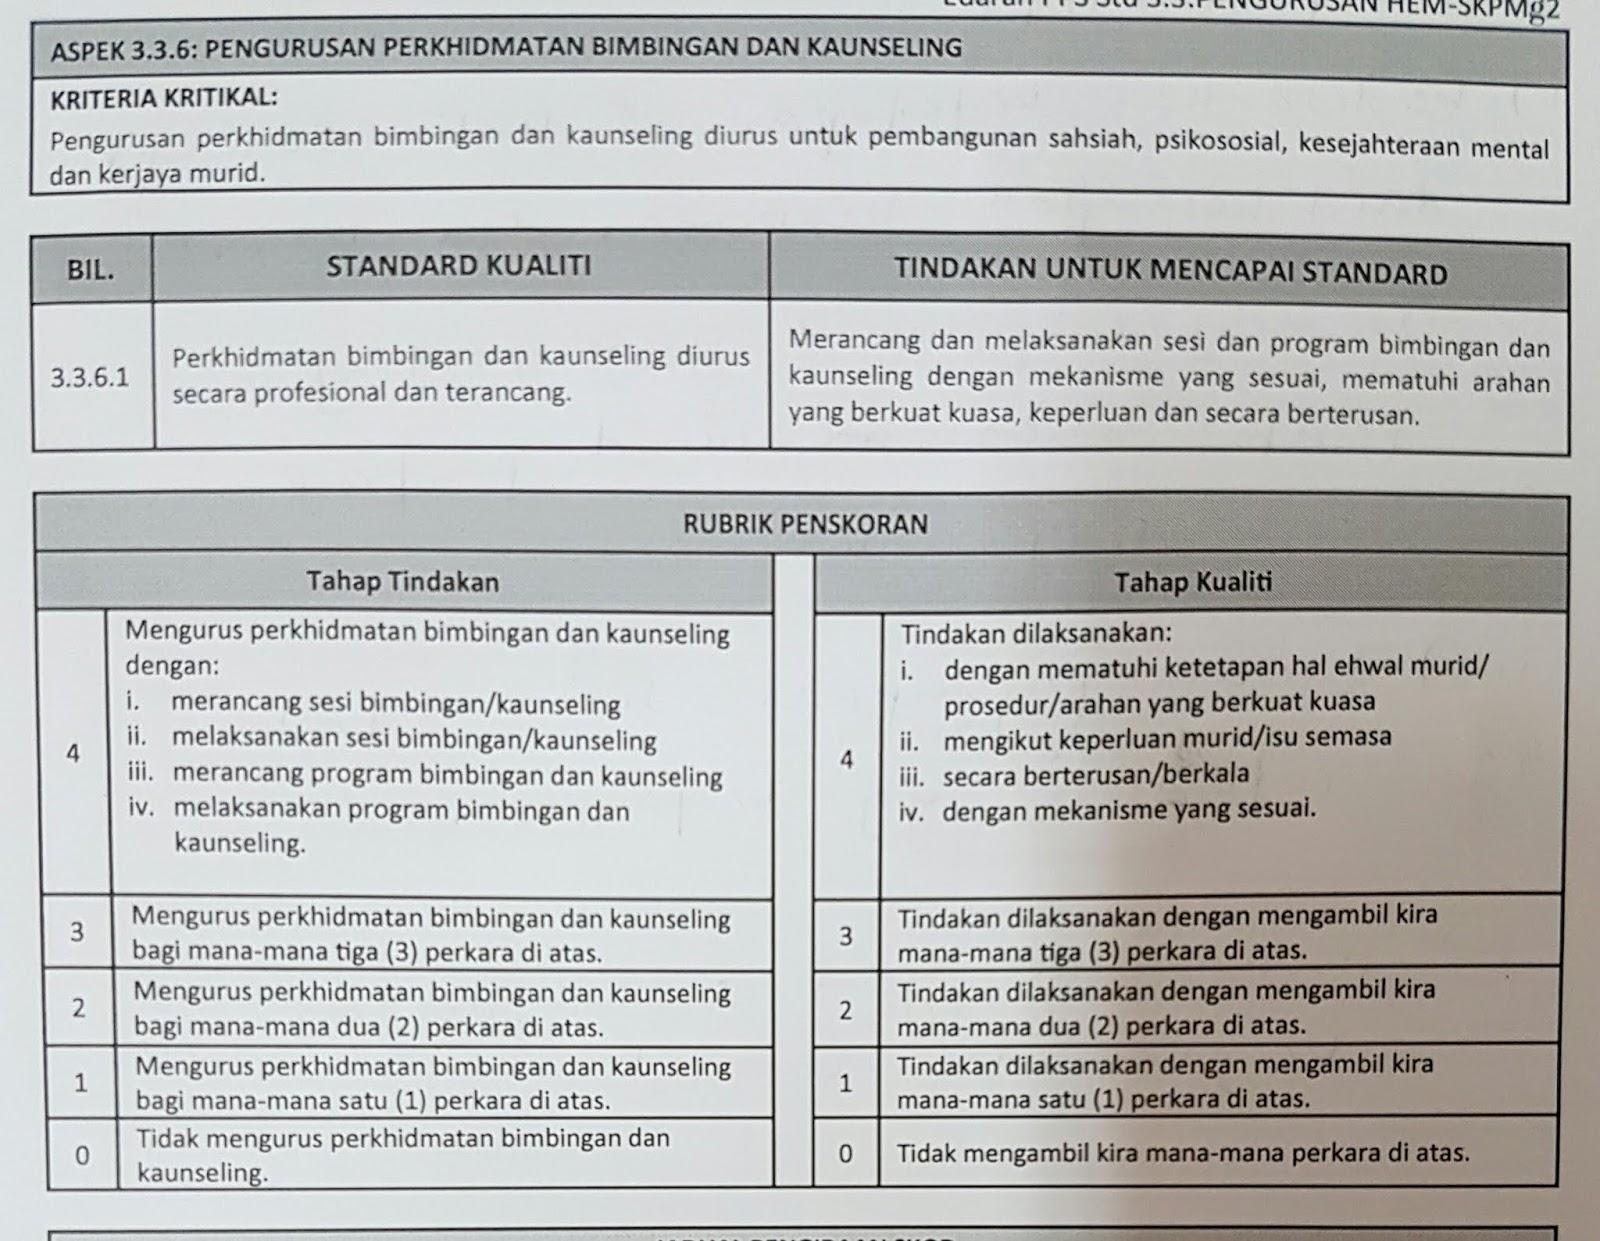 Kaunselor Nurhaiza Che Mat Skpmg2 Kaunseling Psikometrik